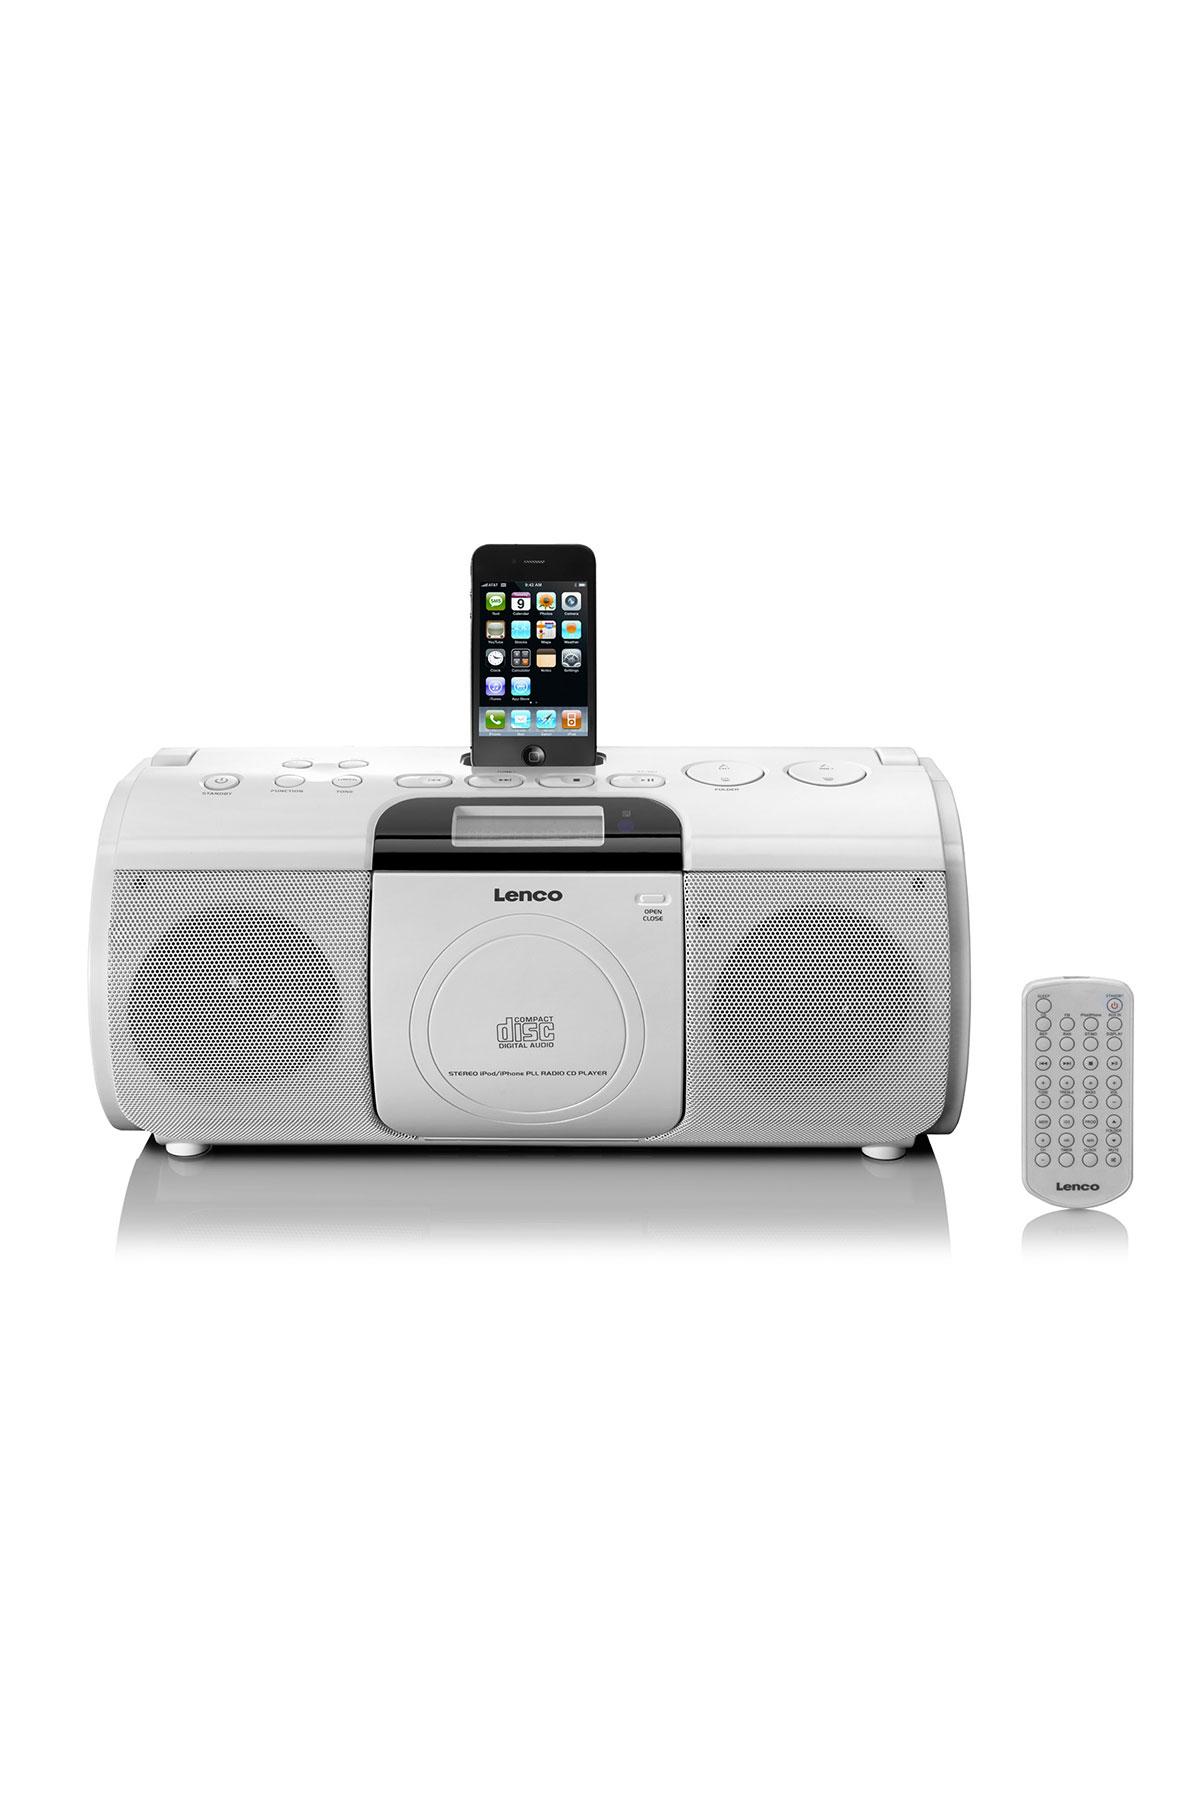 lenco scdi 02 fm radio cd mp3 player with 30 pin iphone. Black Bedroom Furniture Sets. Home Design Ideas